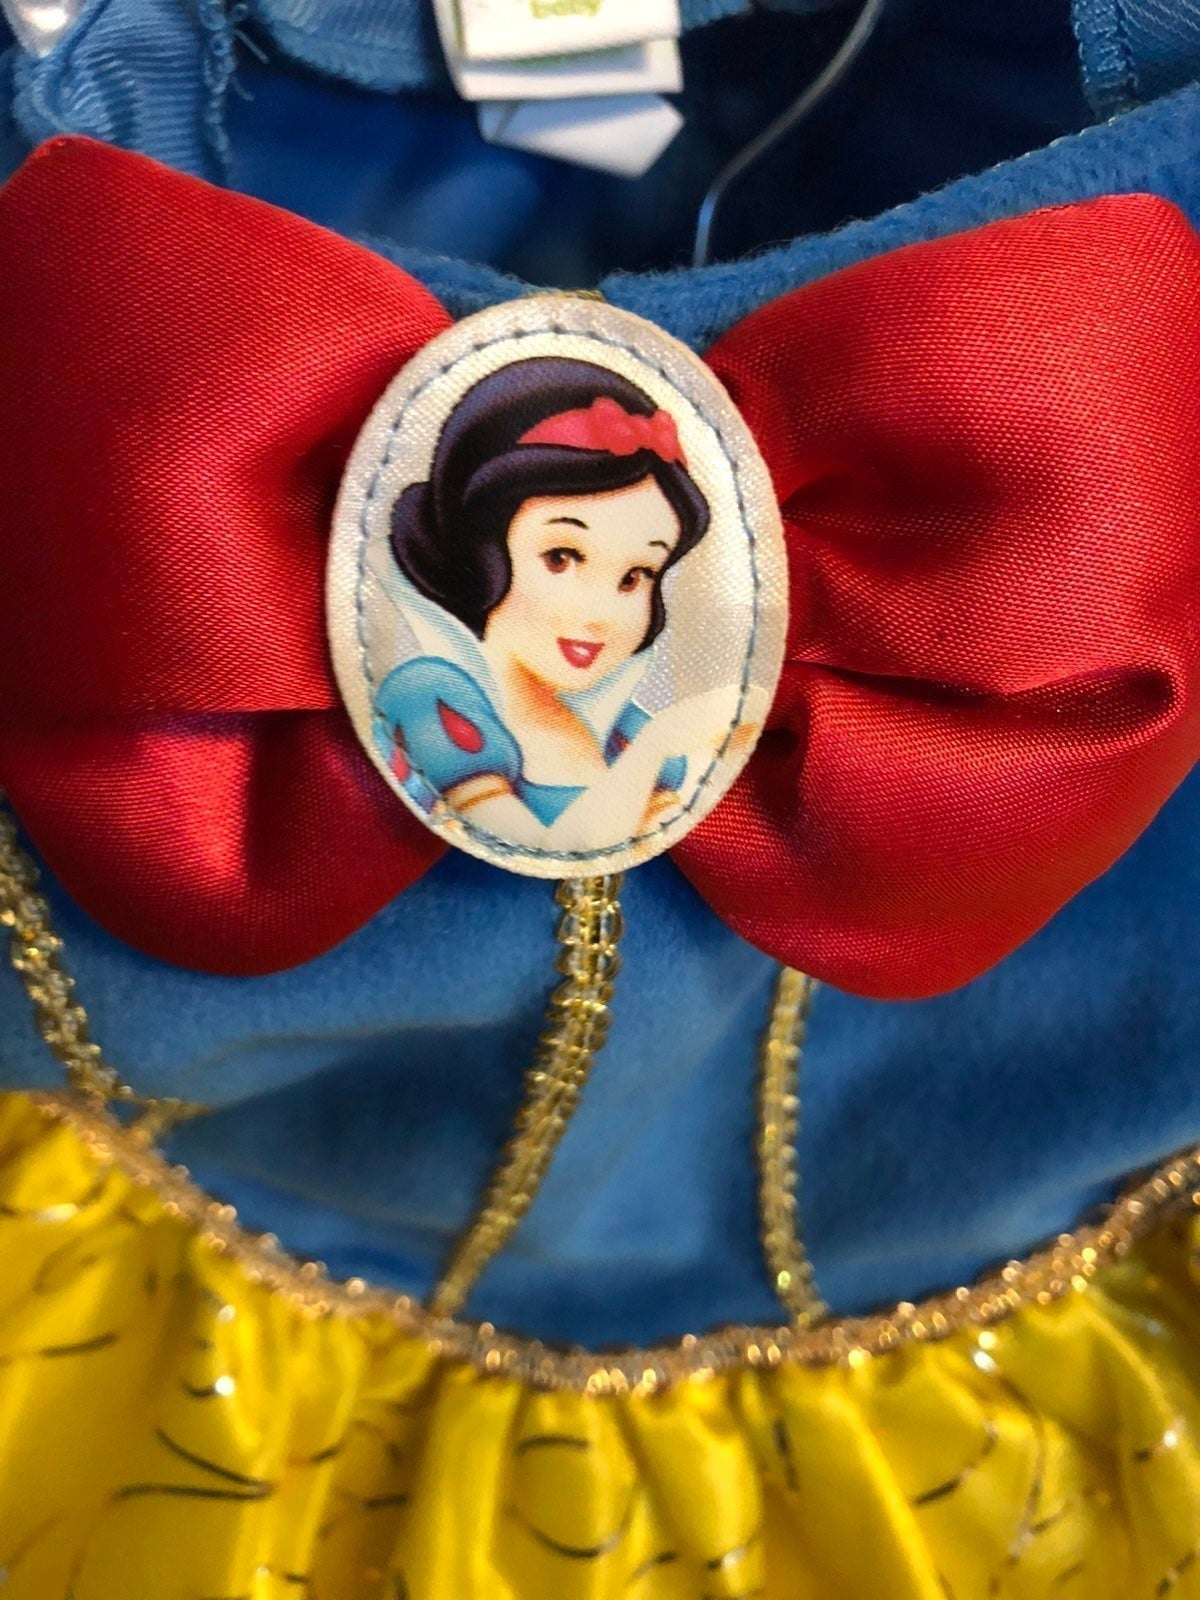 Disney store Snow white dressup/costume